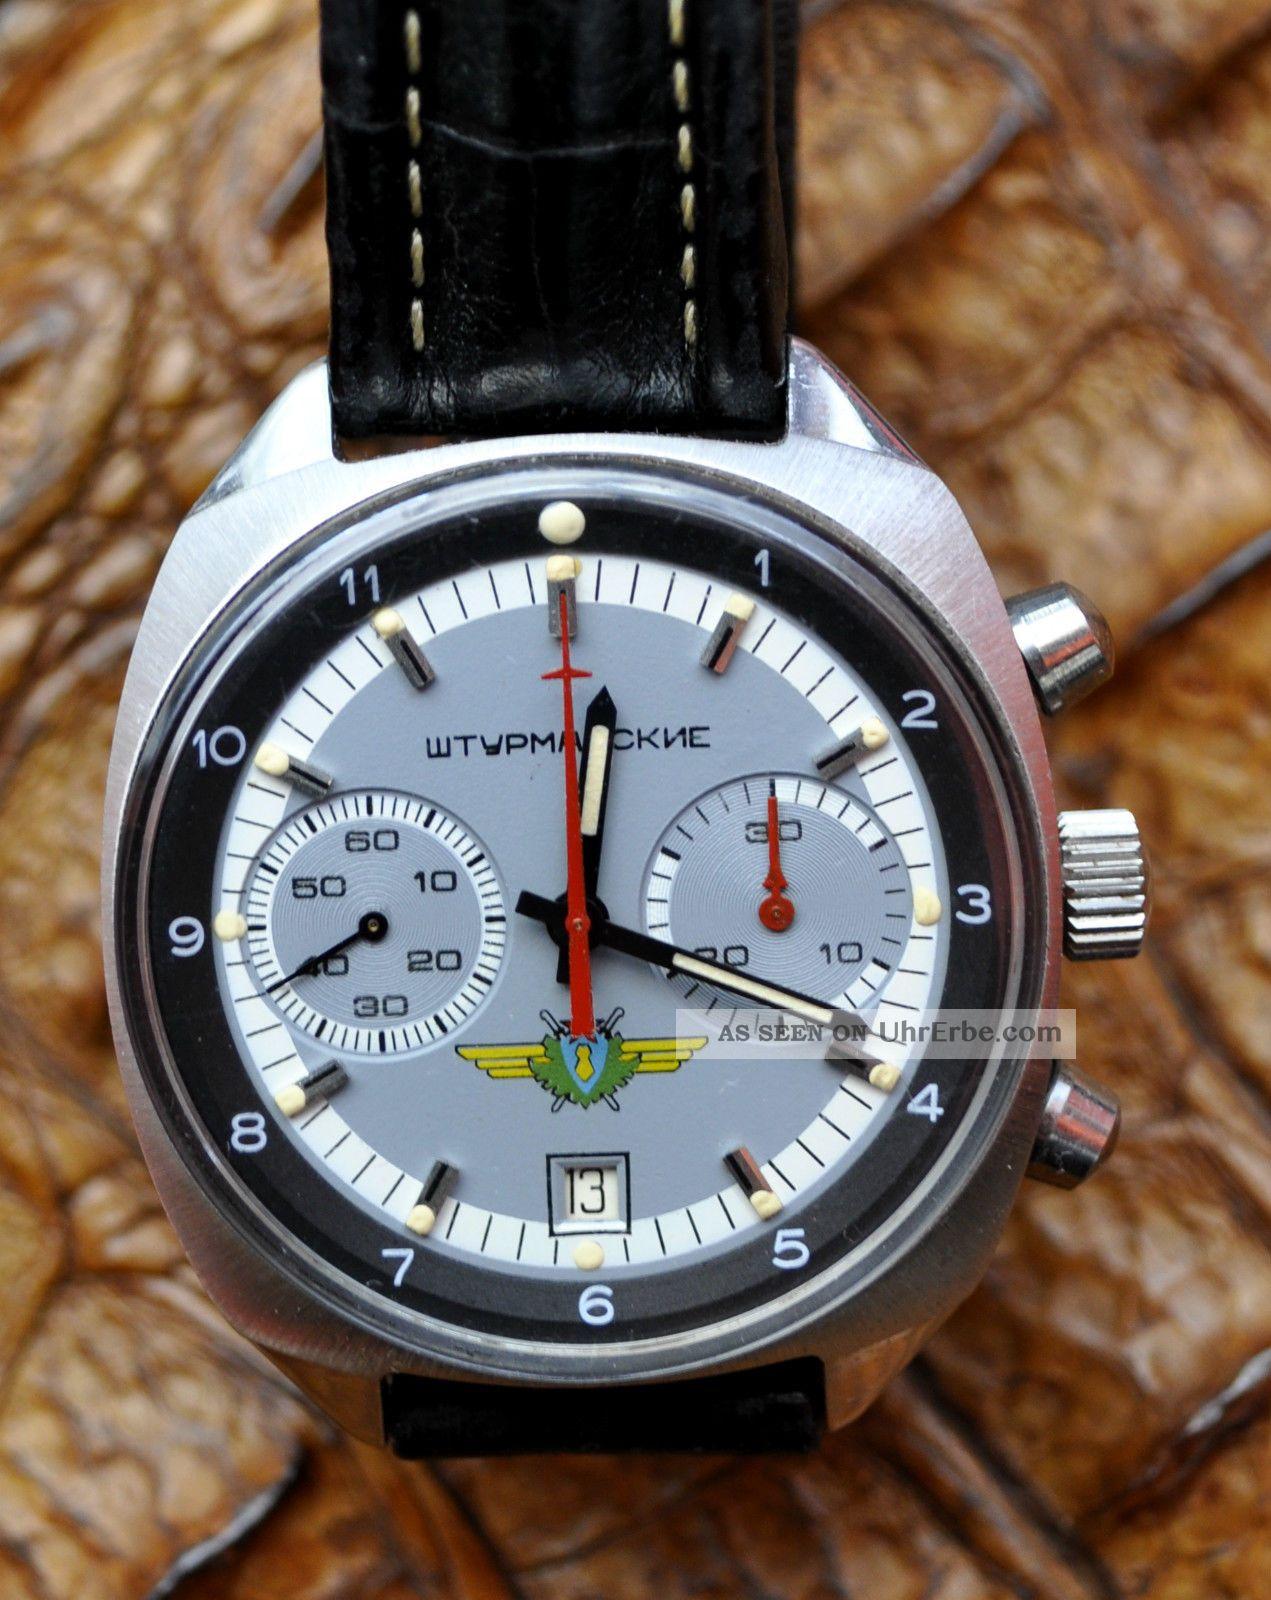 Poljot Chronograph Sturmanskie Stoppsekunde Armbanduhren Bild